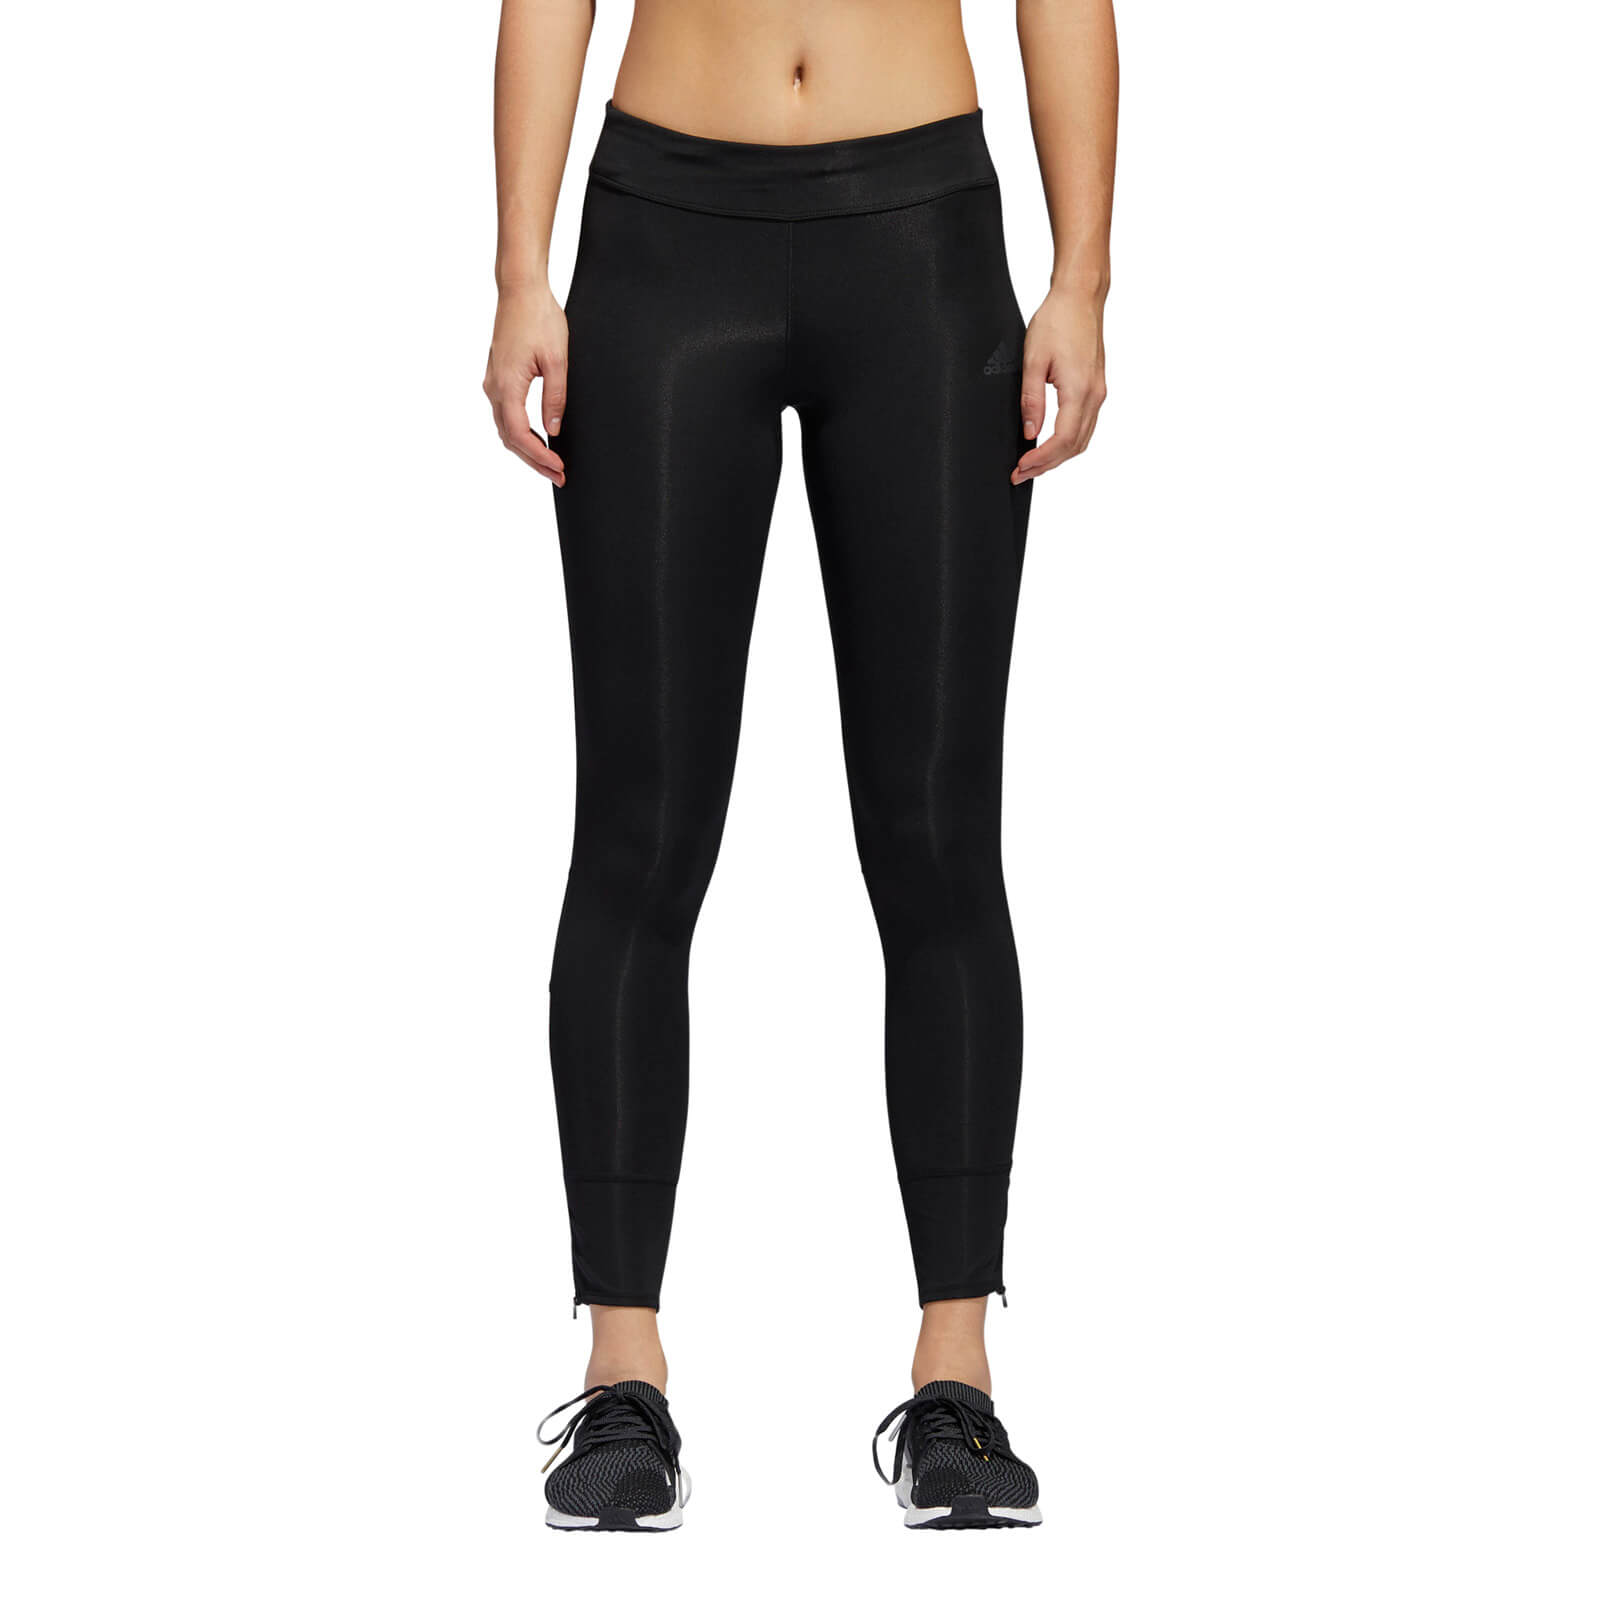 00fa255b0cc adidas Women's Response Long Tights - Black   ProBikeKit.com